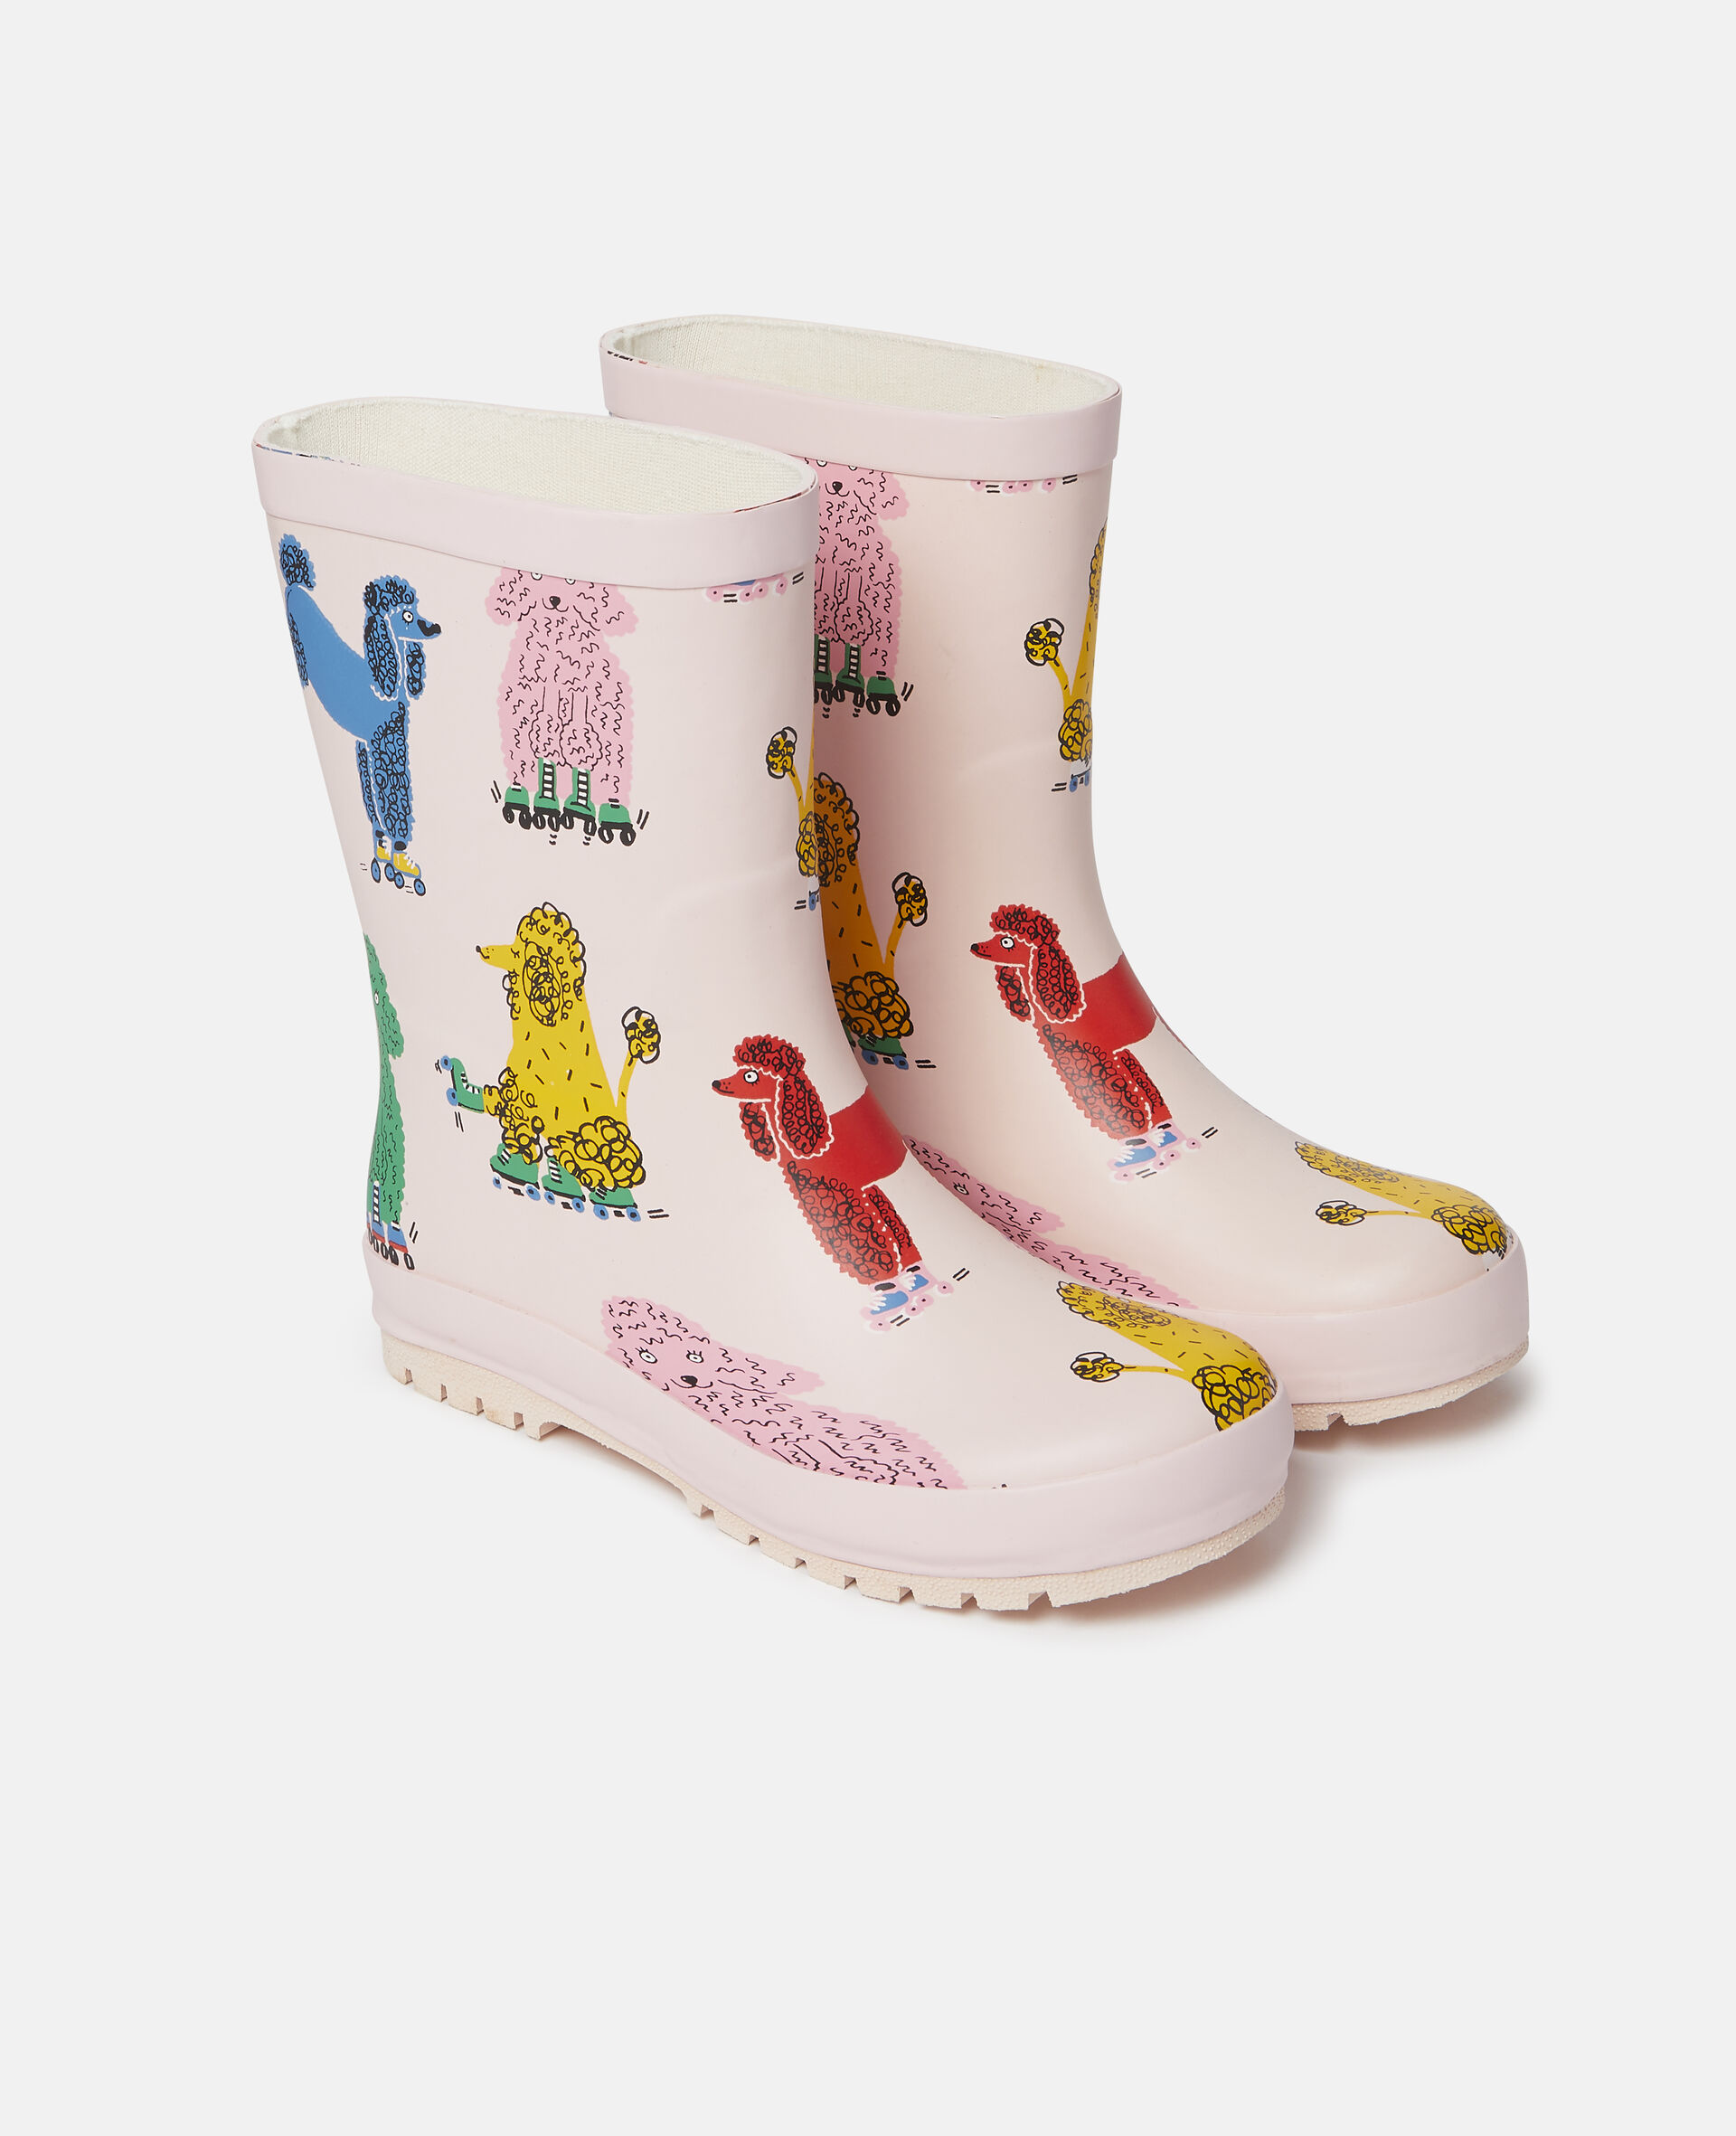 Doodle Poodles Waterproof Rainboots-Pink-large image number 3